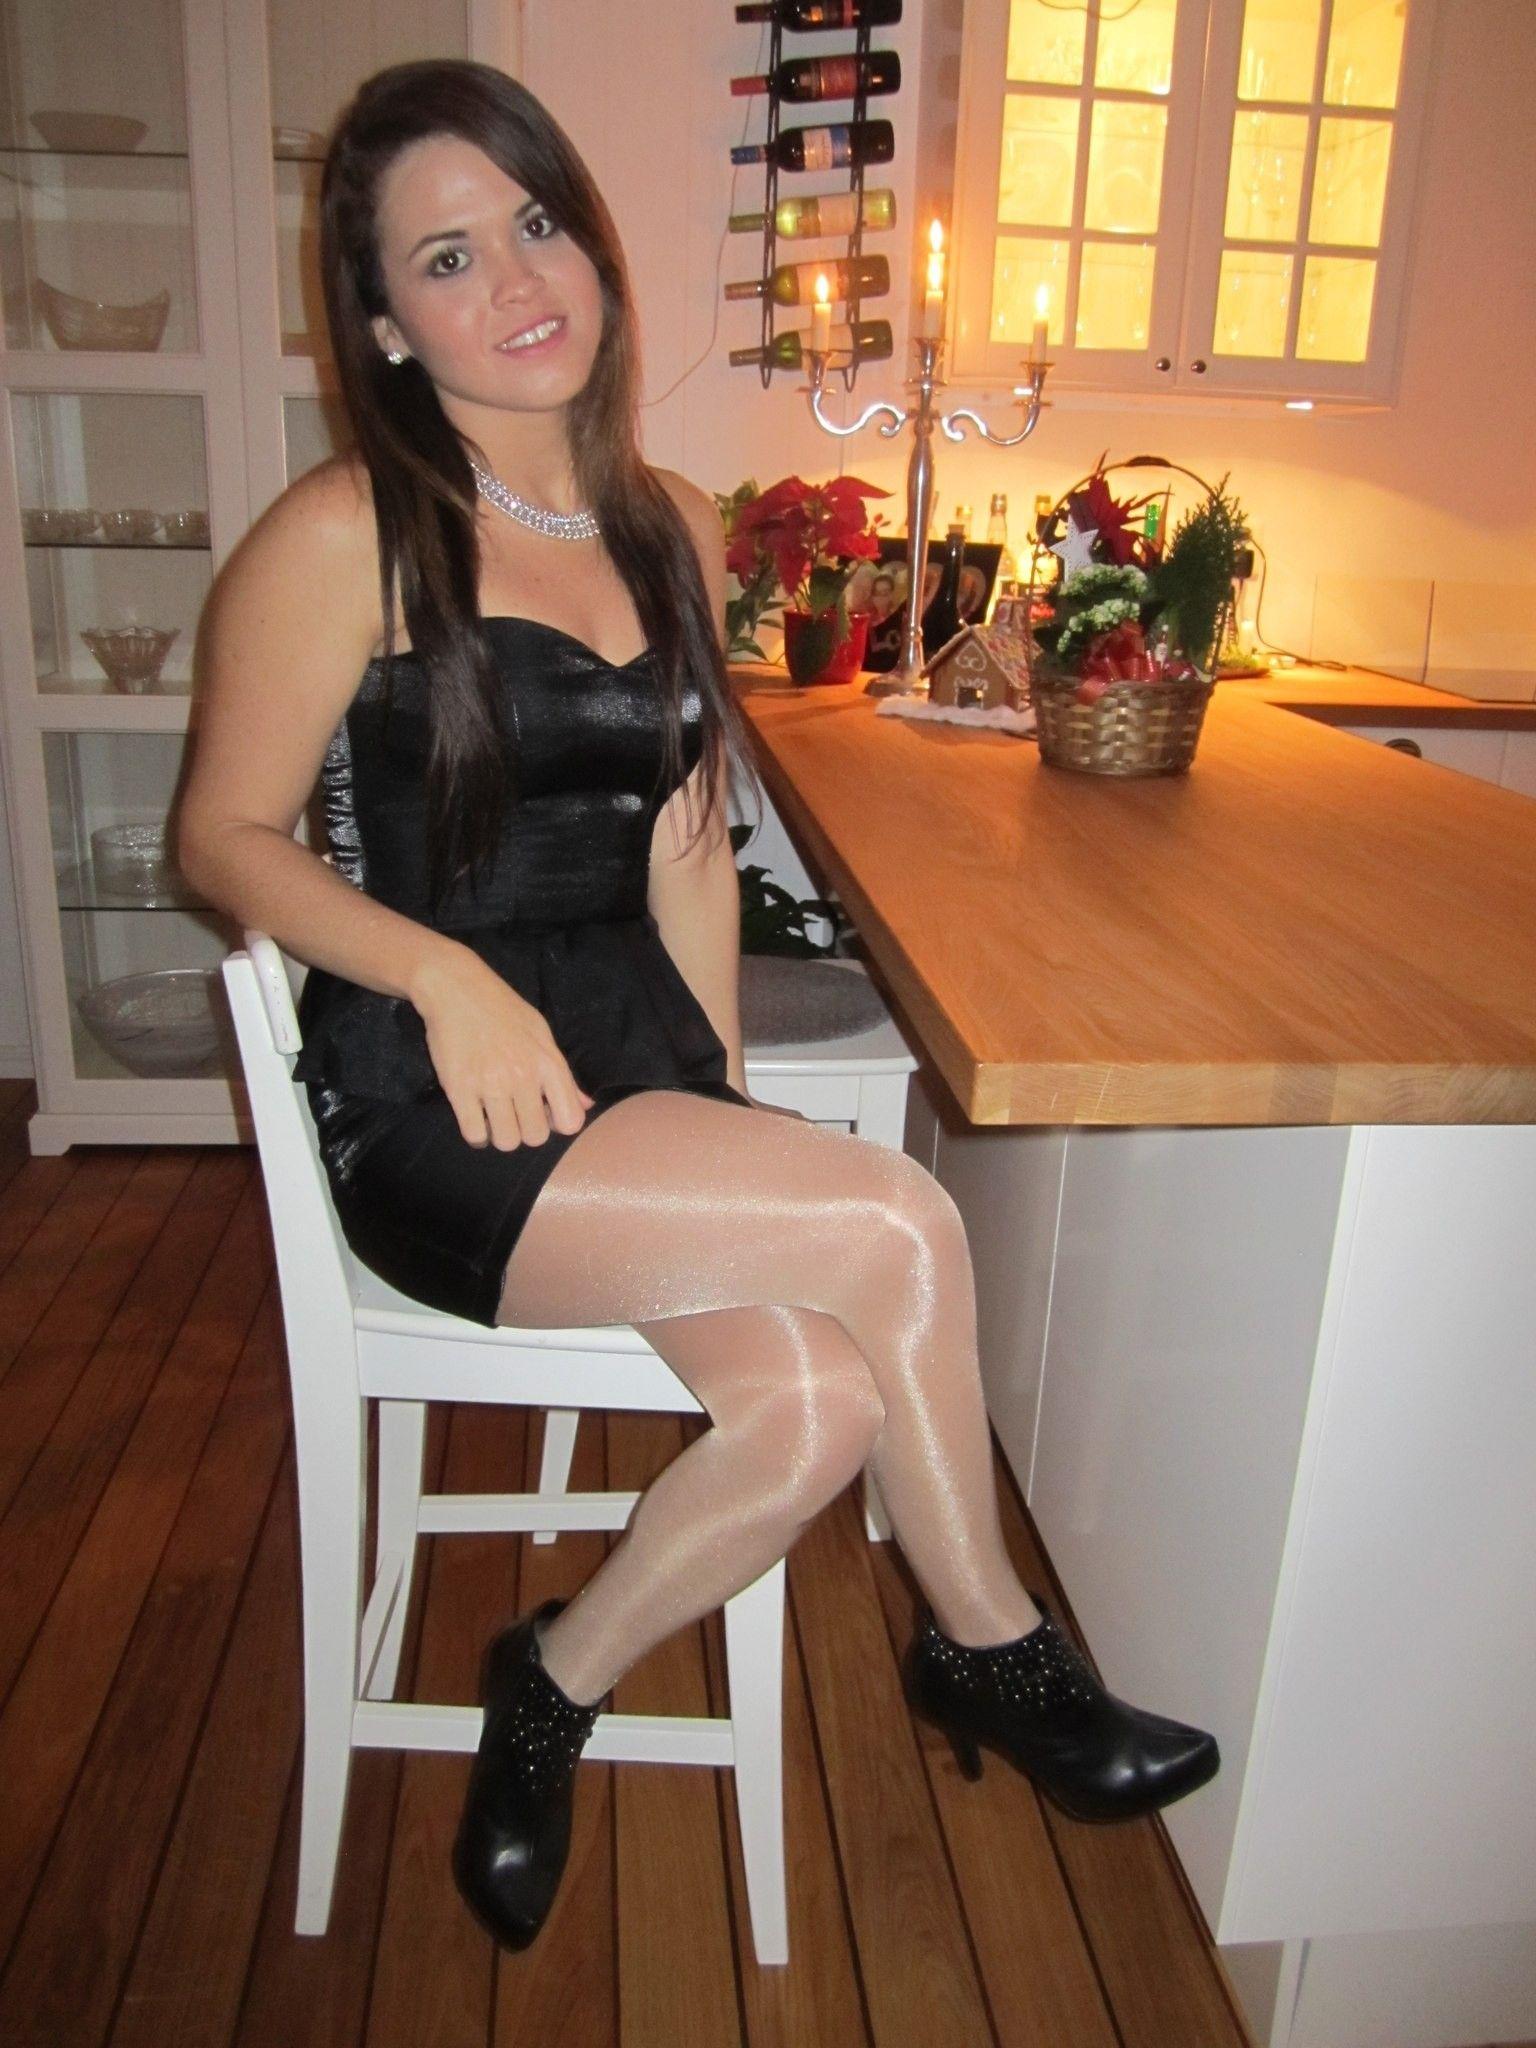 pinshadow on nice pantyhose pinups | pinterest | she s, hosiery